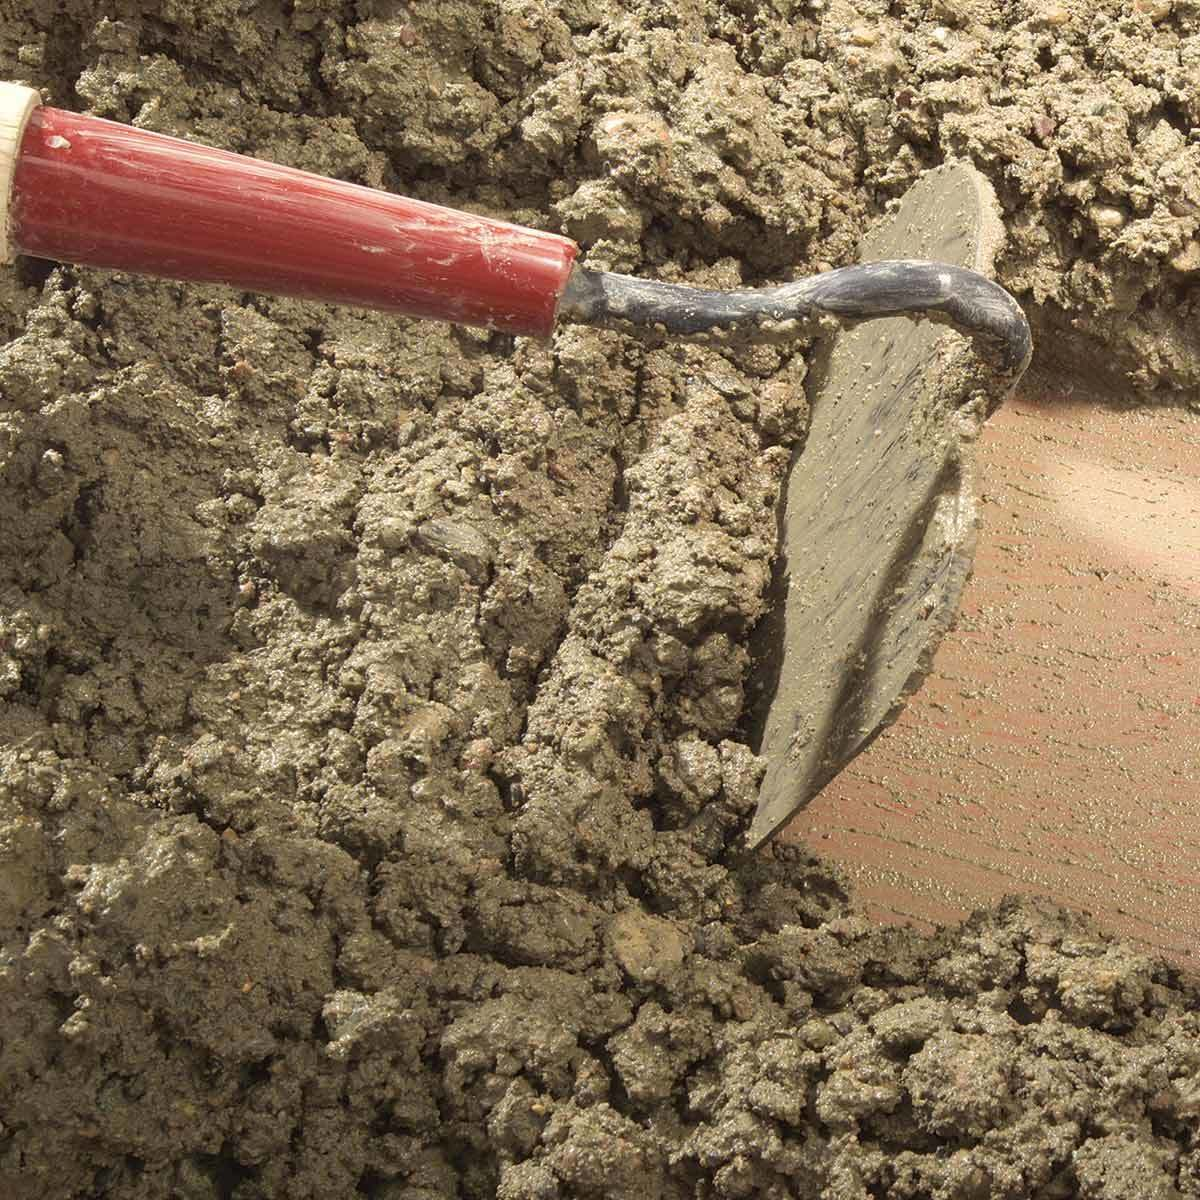 How to Sharpen Garden Tools | The Family Handyman